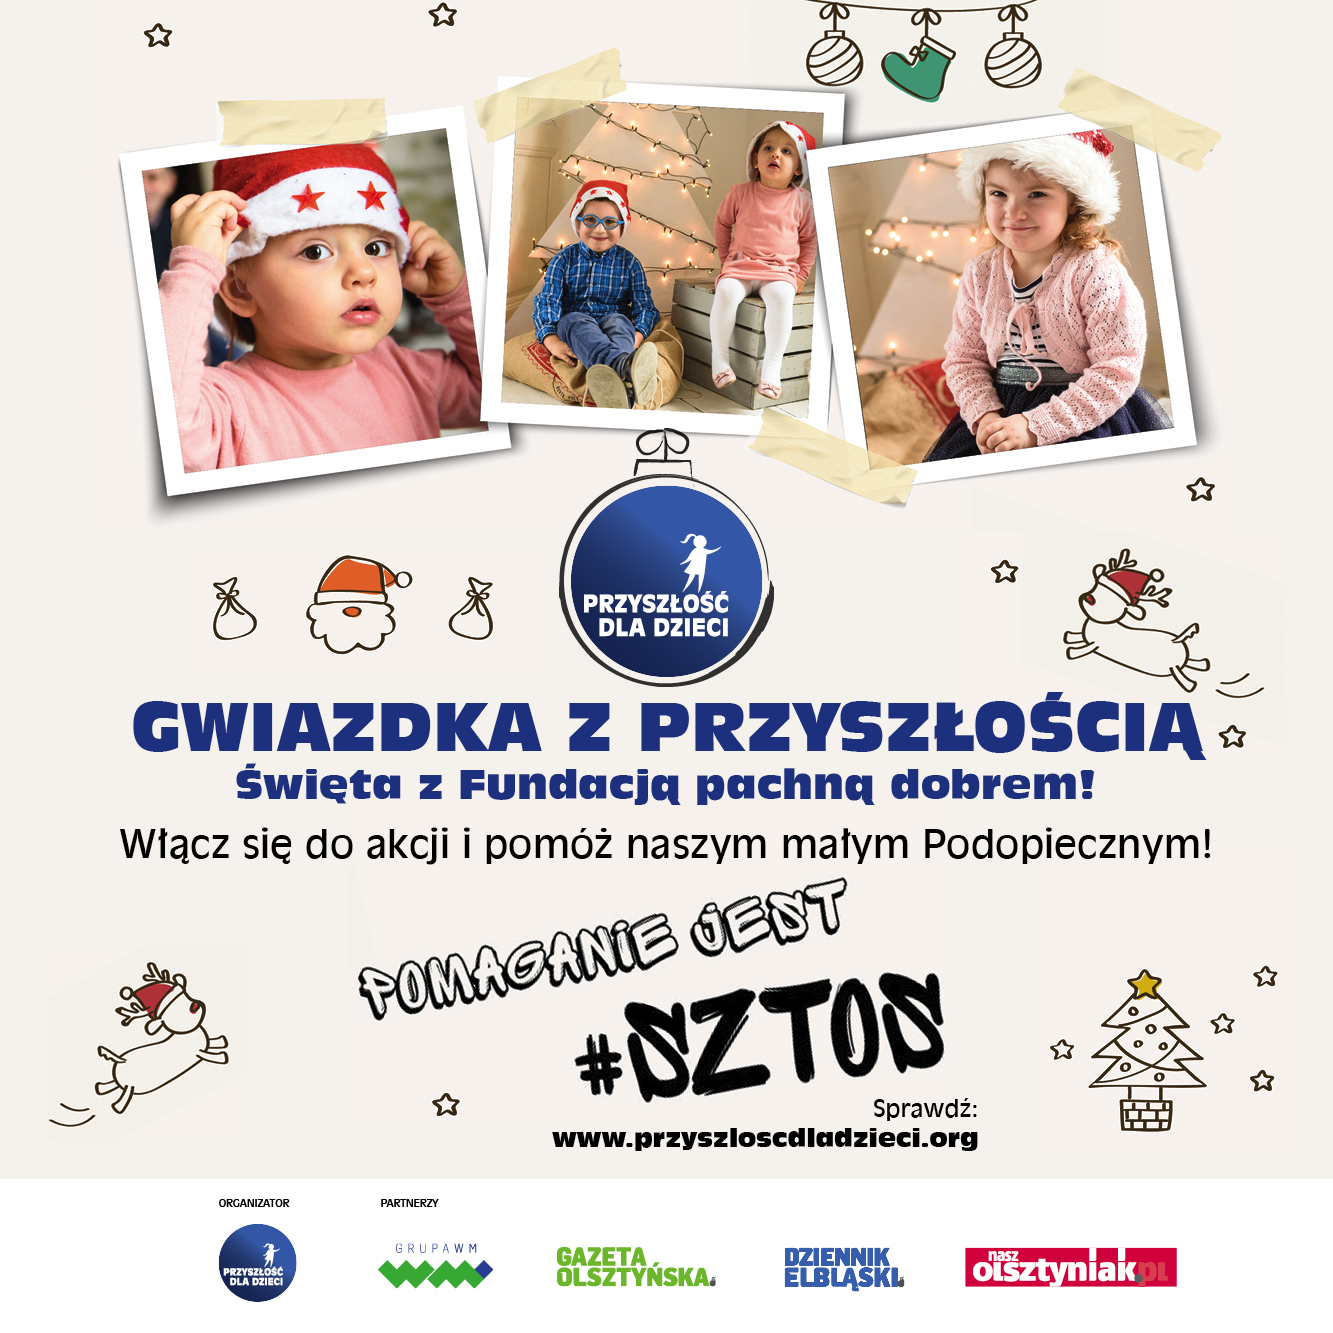 http://m.wm.pl/2018/11/orig/plakat-gwiazdka-podstawowy-internet-511977.jpg